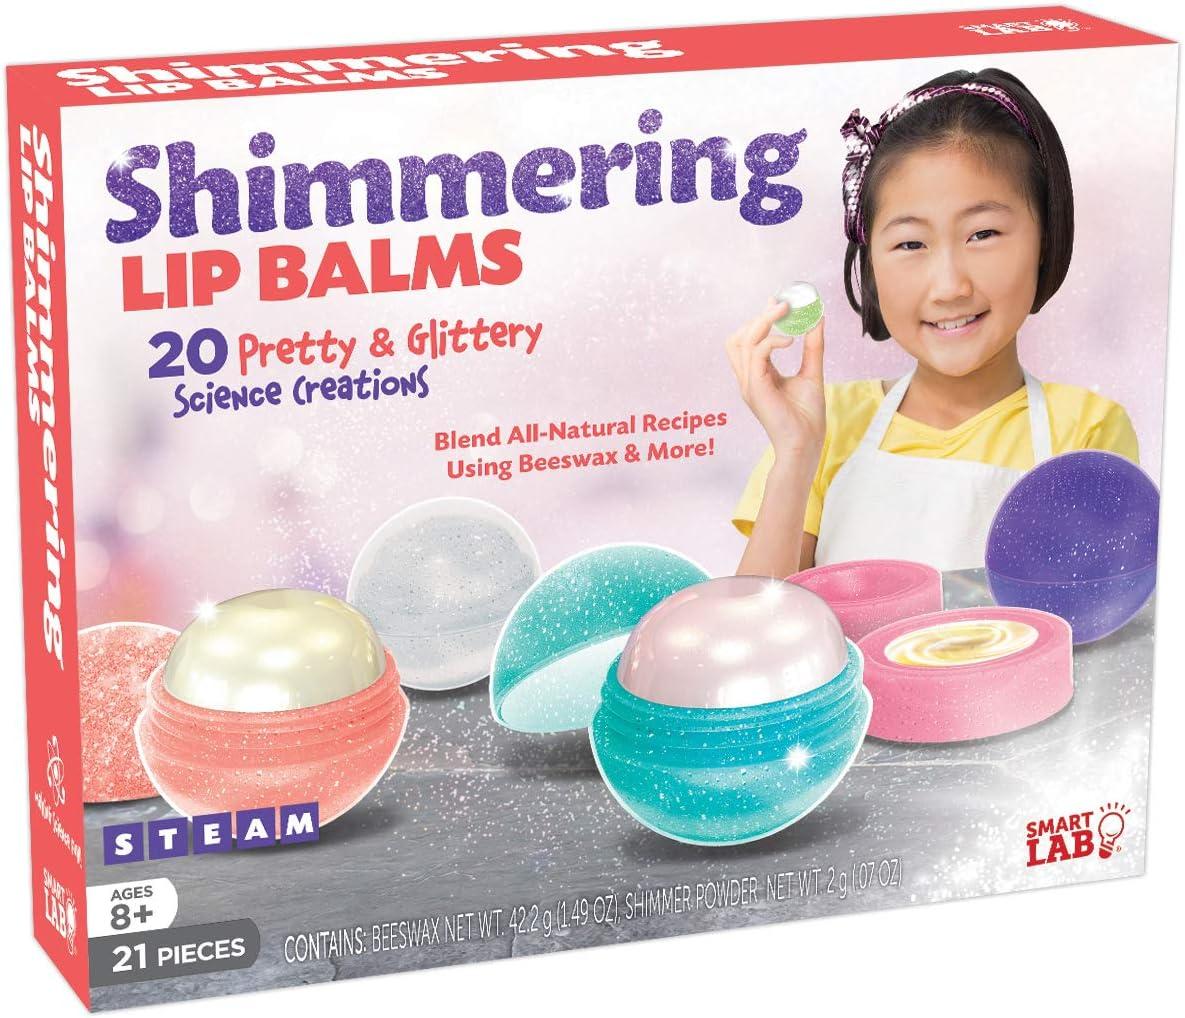 "SmartLab Toys Shimmering Lip Balm - 21 Pieces - 20 Recipes - 5 Lip Balm Pods, 11 1/4"" H x 8 1/2"" W x 2 1/4"" D"